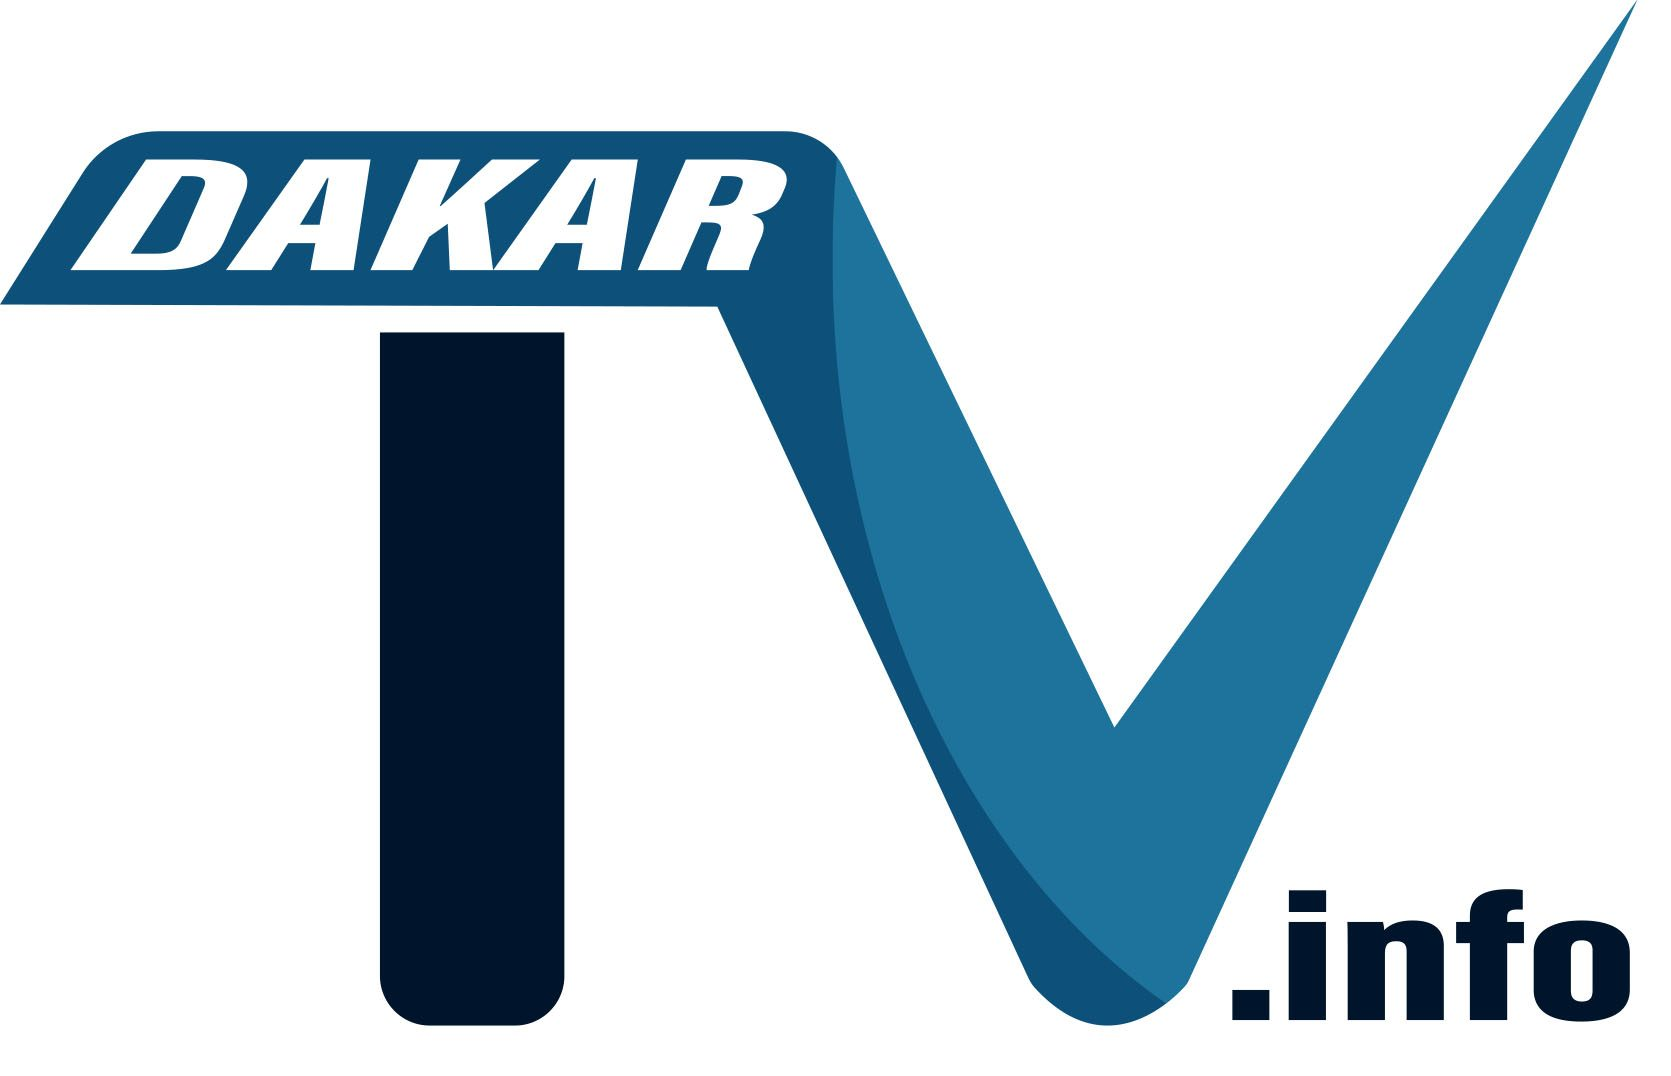 DakarTv.info